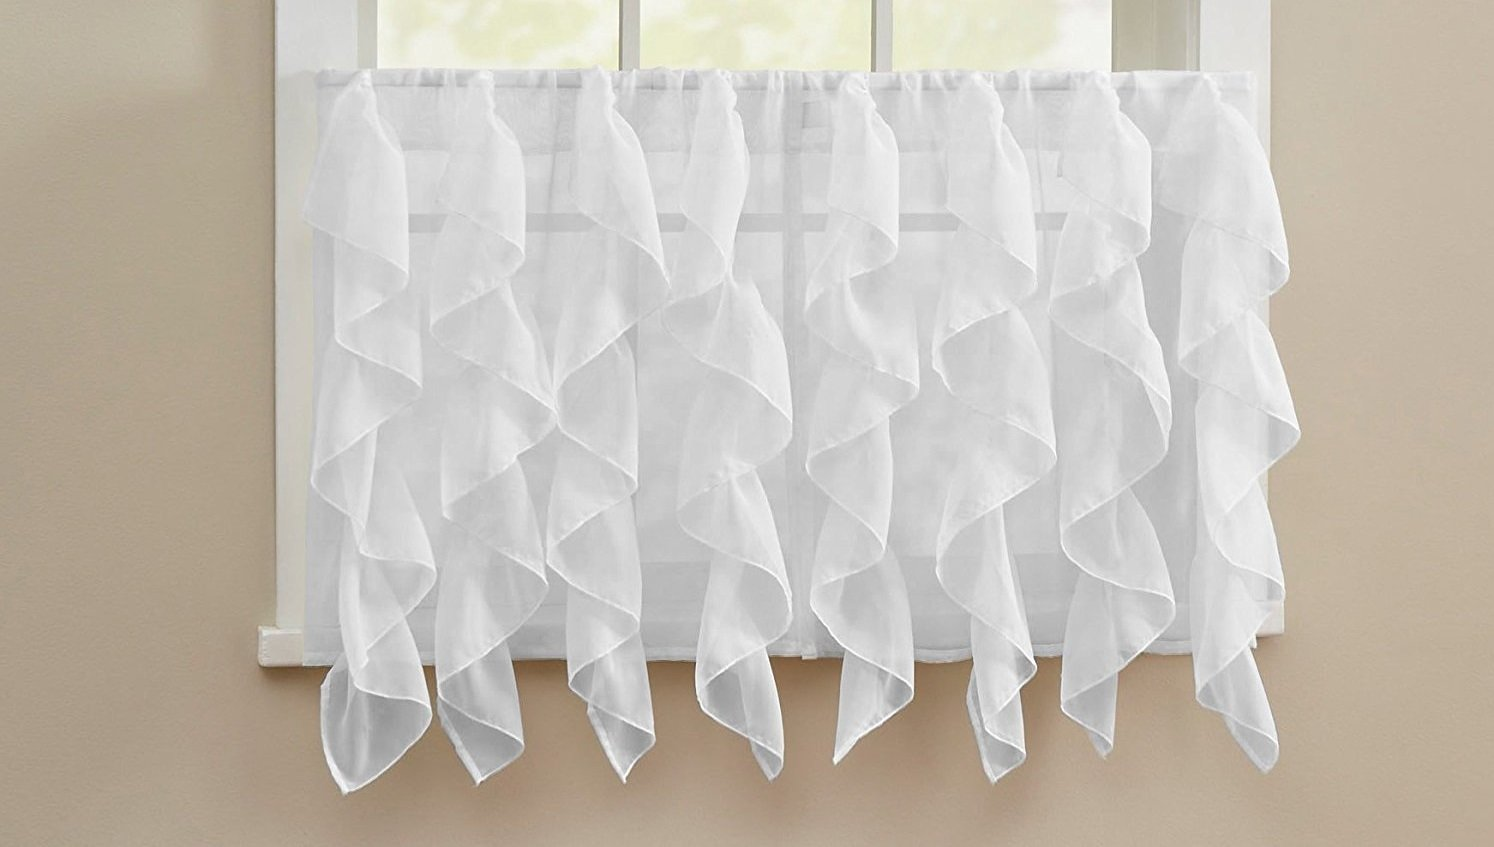 "Lorraine Elegance Cascading Waterfall Ruffled Sheer Voile Kitchen Curtain Tier Pair (52"" x 36"") - White"